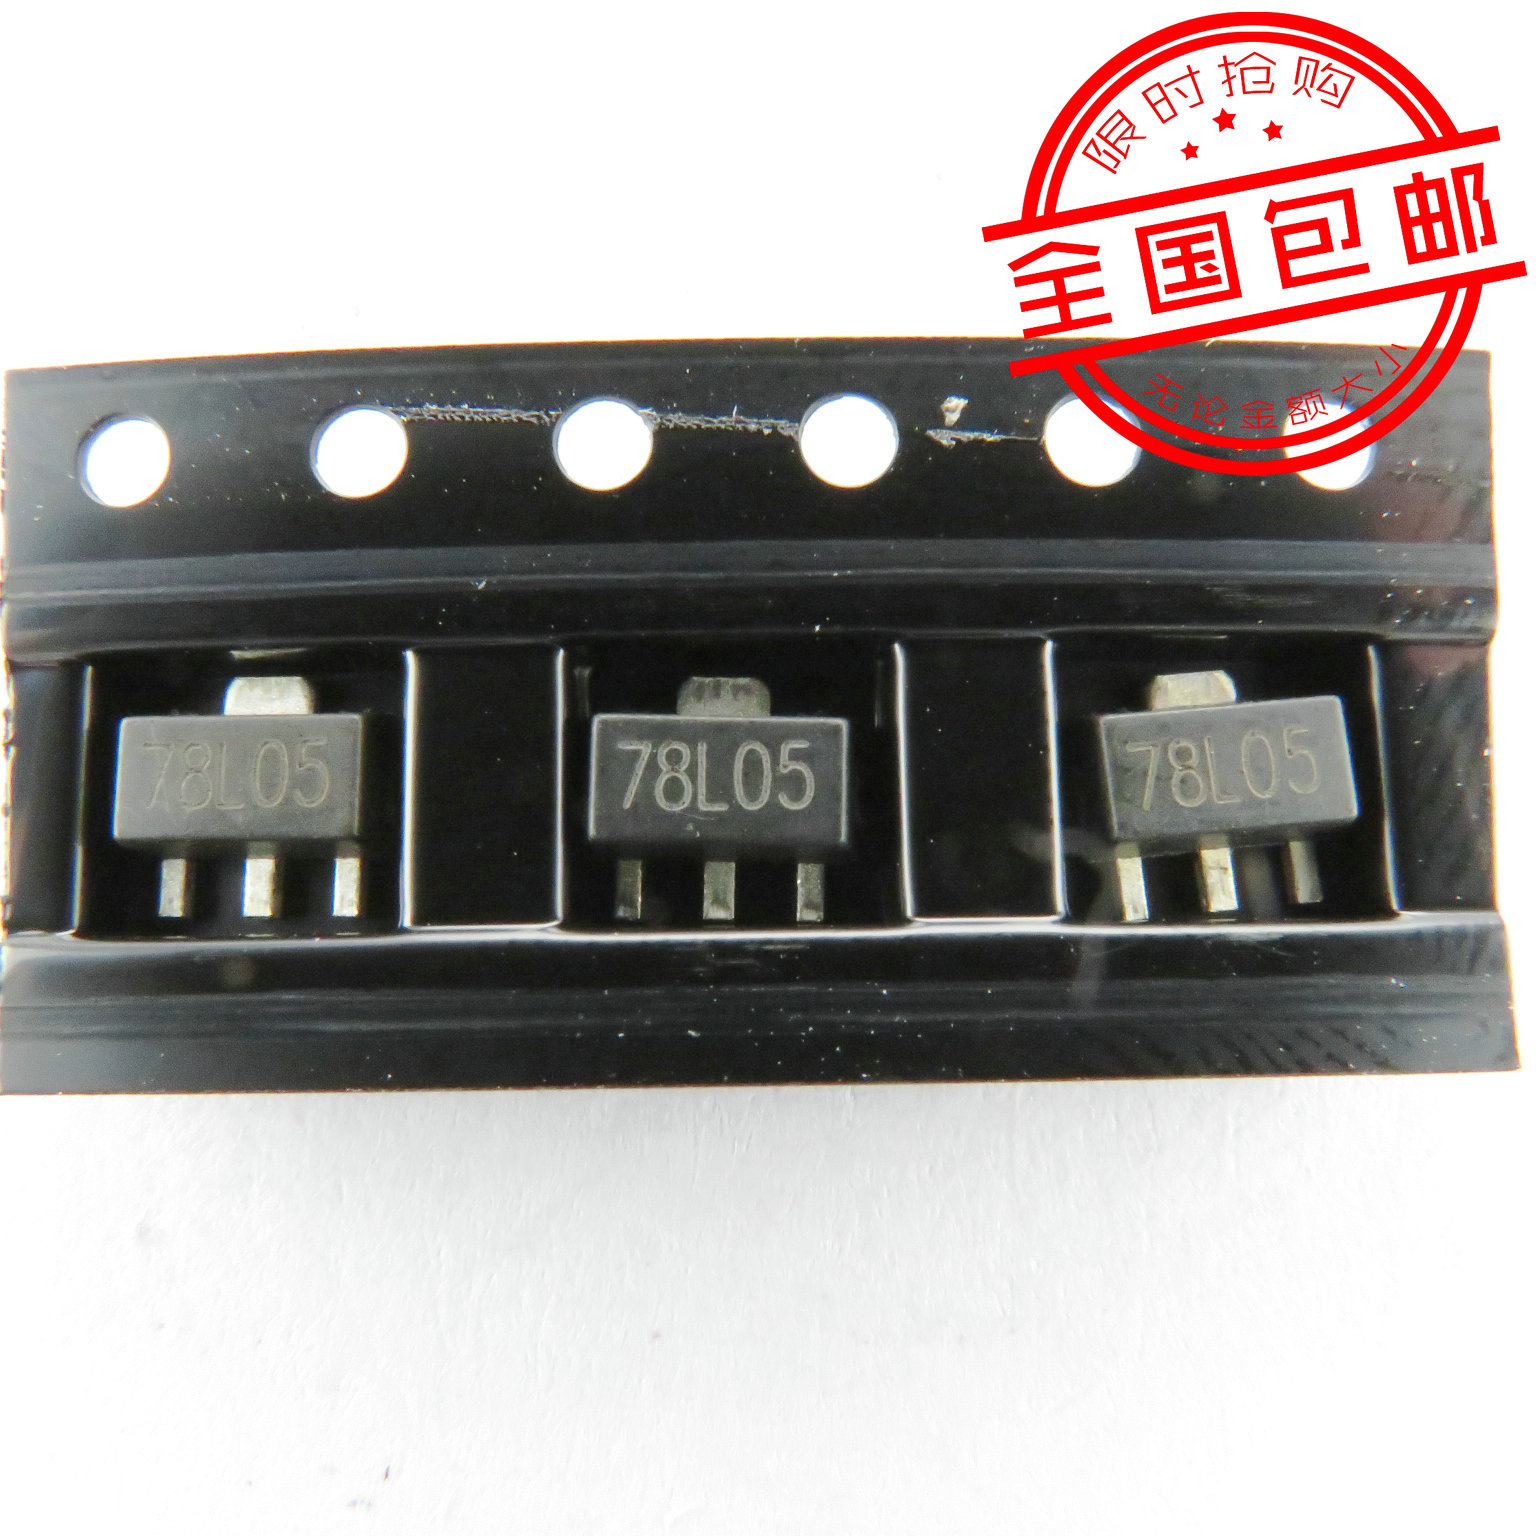 Транзистор |Патч транзистор 5В 78l05 три терминала регулятора напряжения сот-89(100 $ 15)